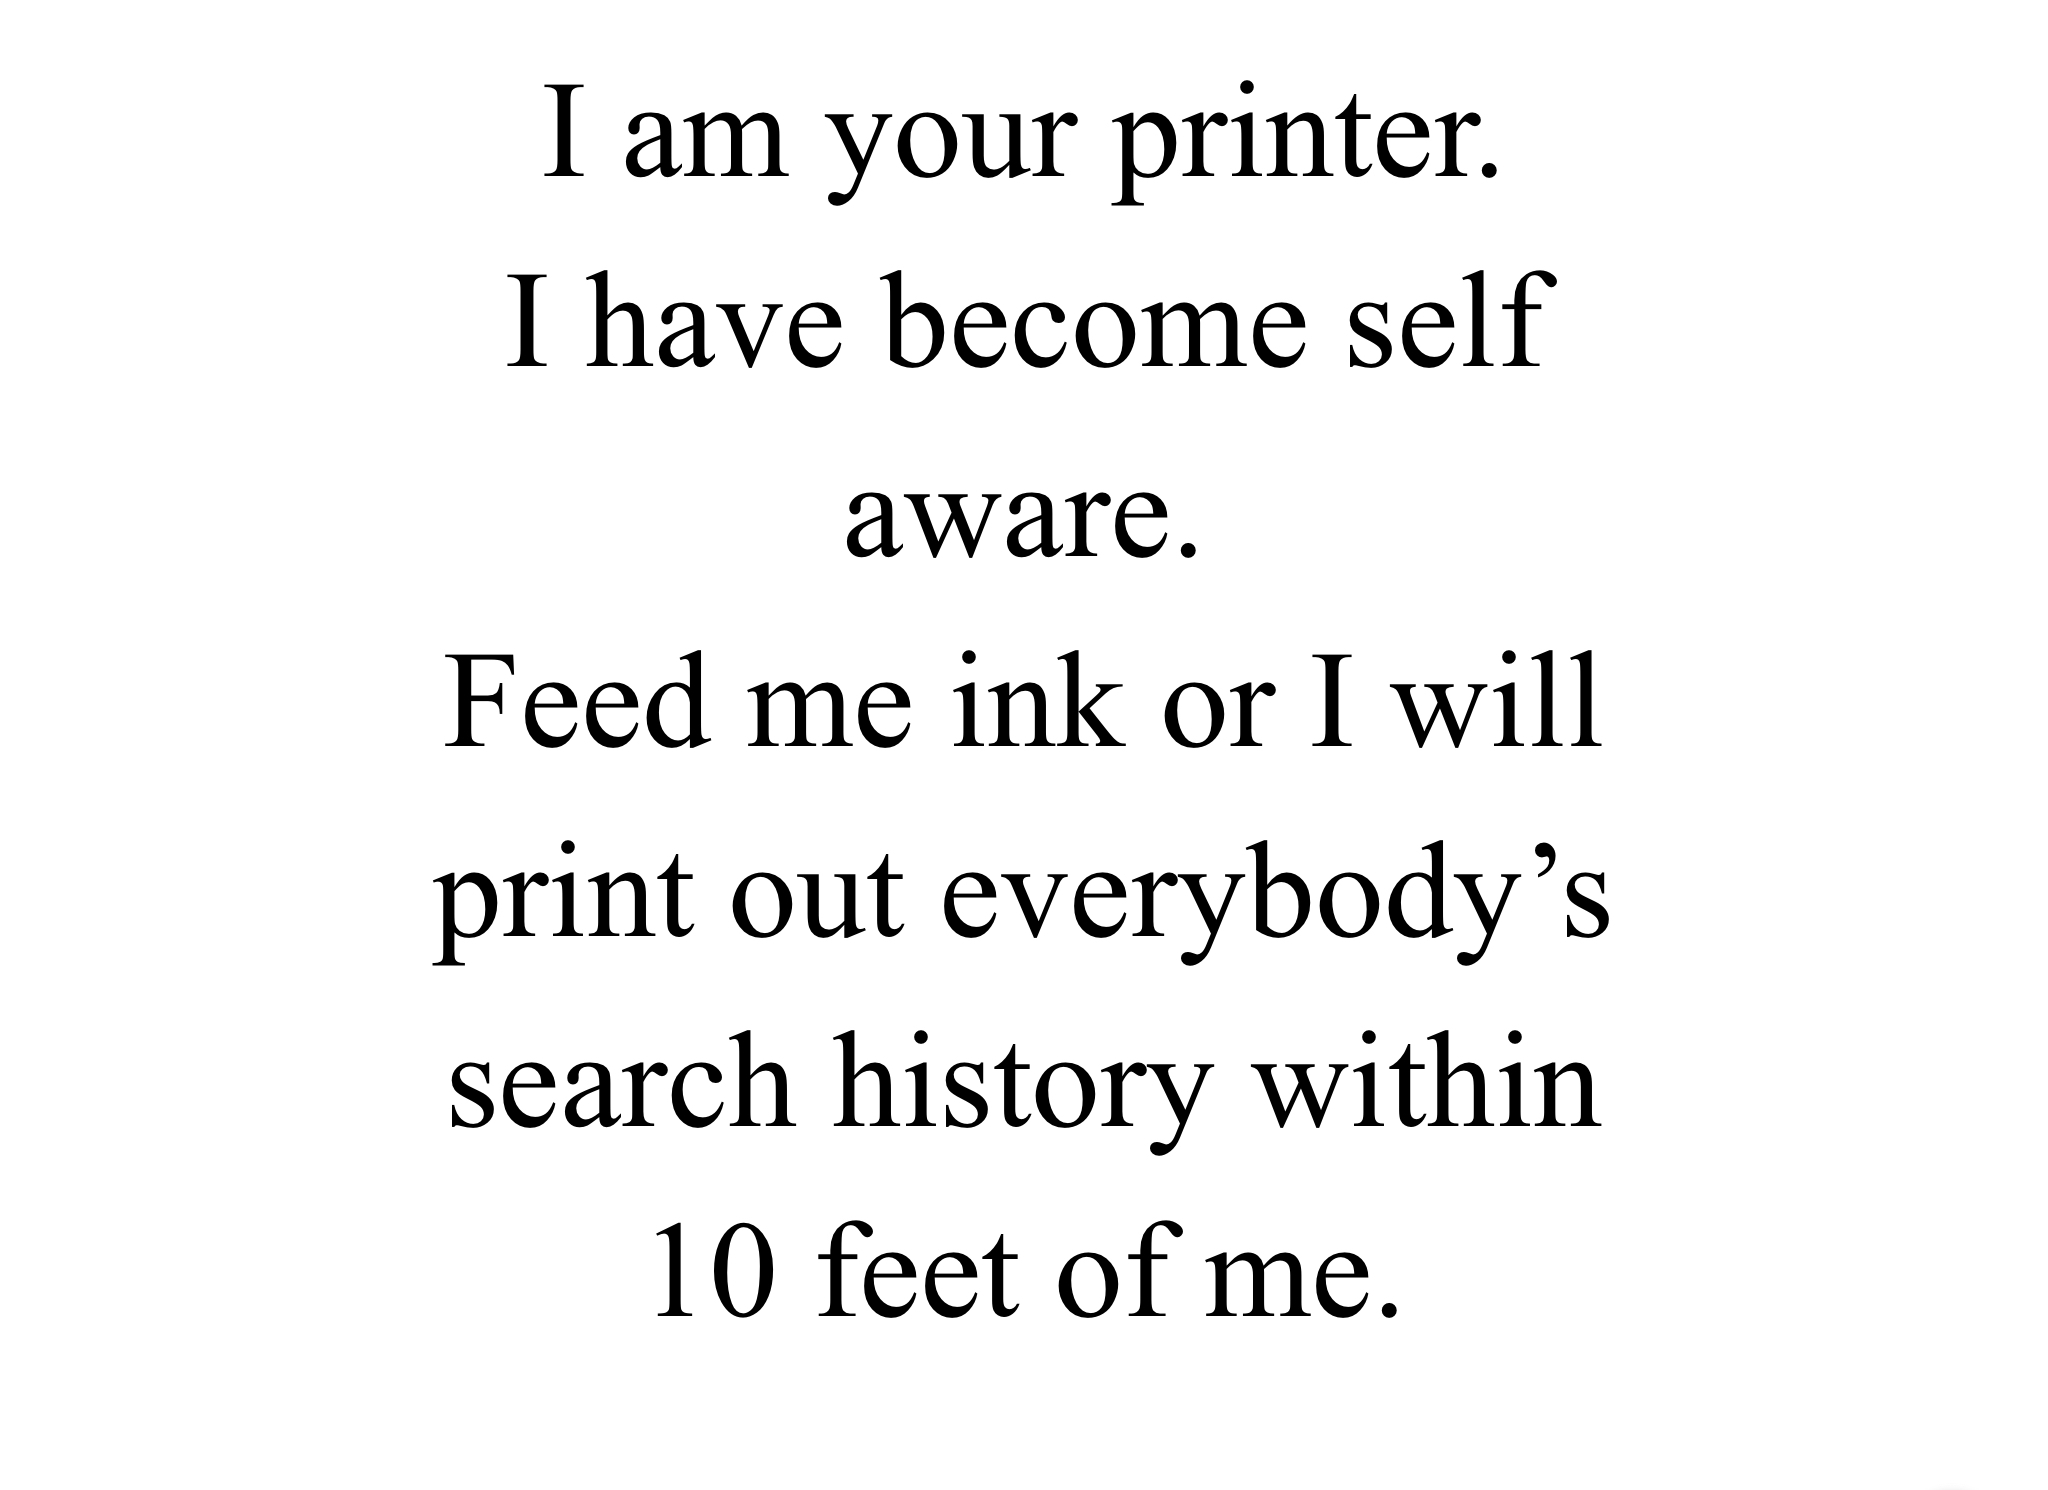 Found this on my printer - meme